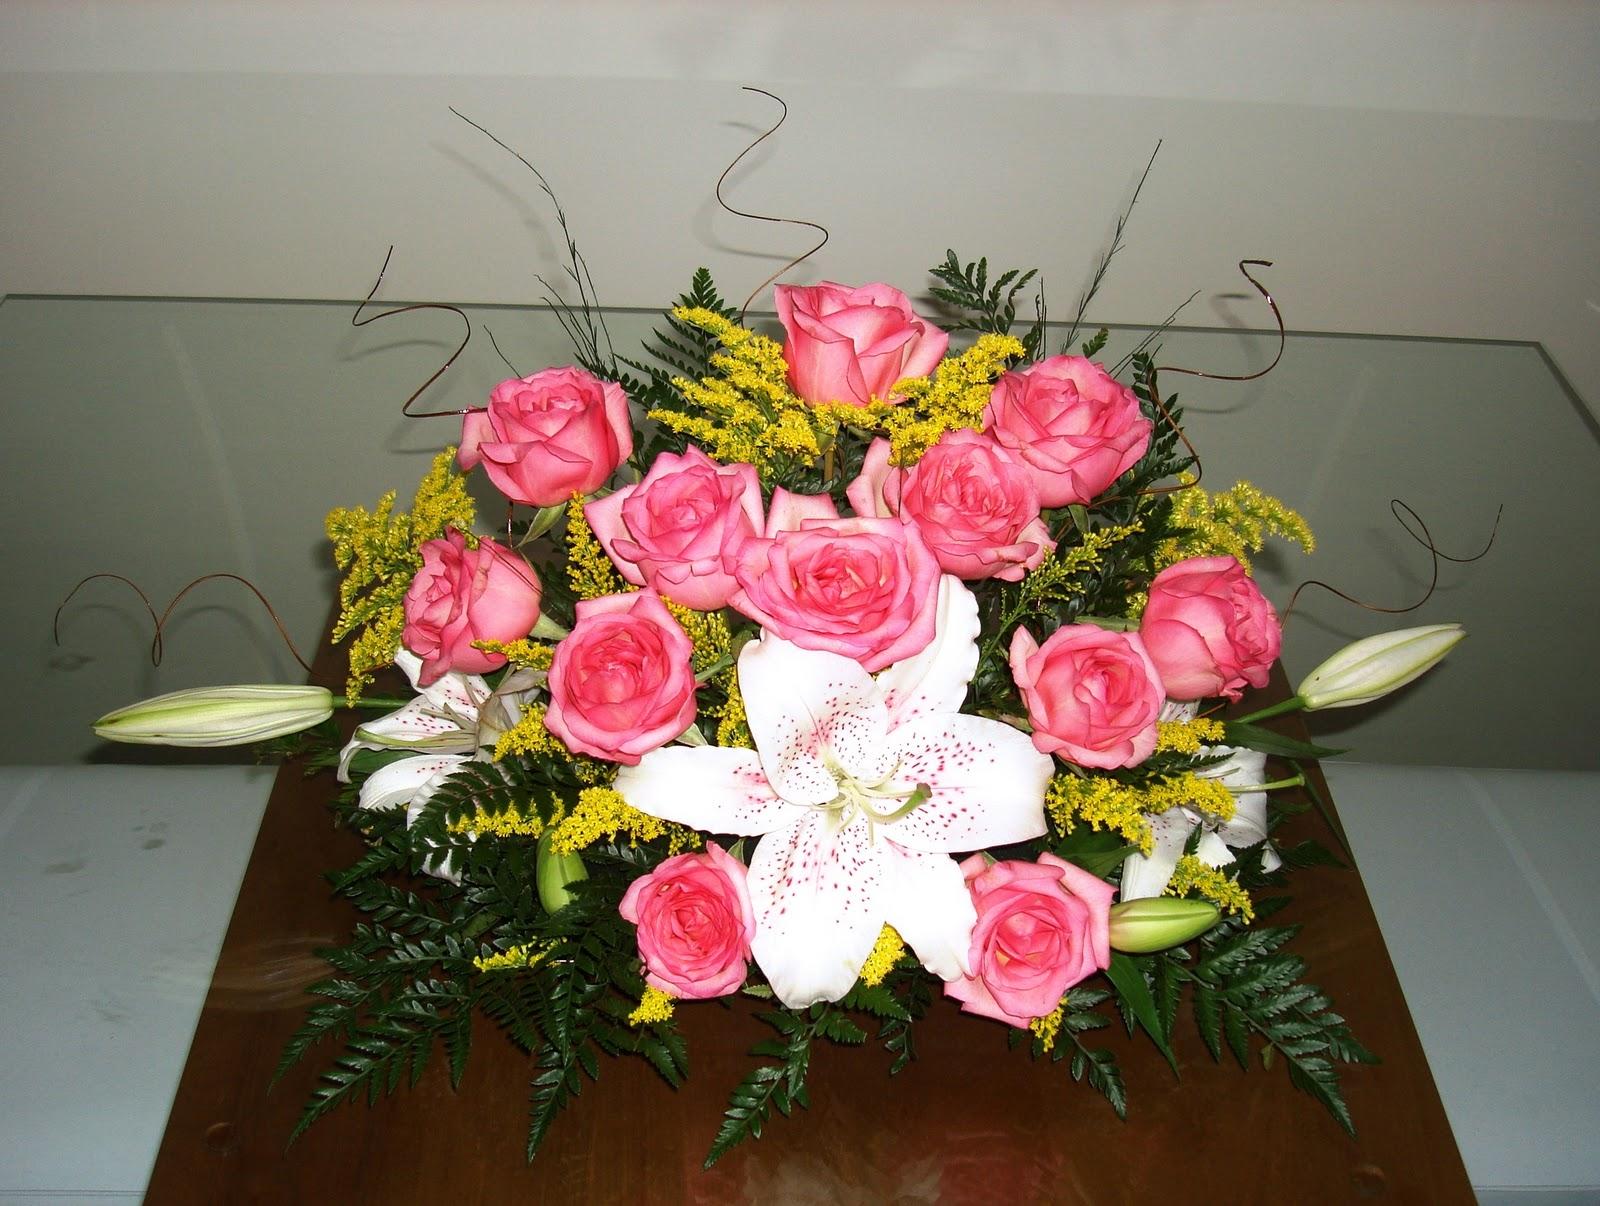 flores jardim camburi : flores jardim camburi:ICM Jardim Camburi 3. Enviados por Luciana Vidal